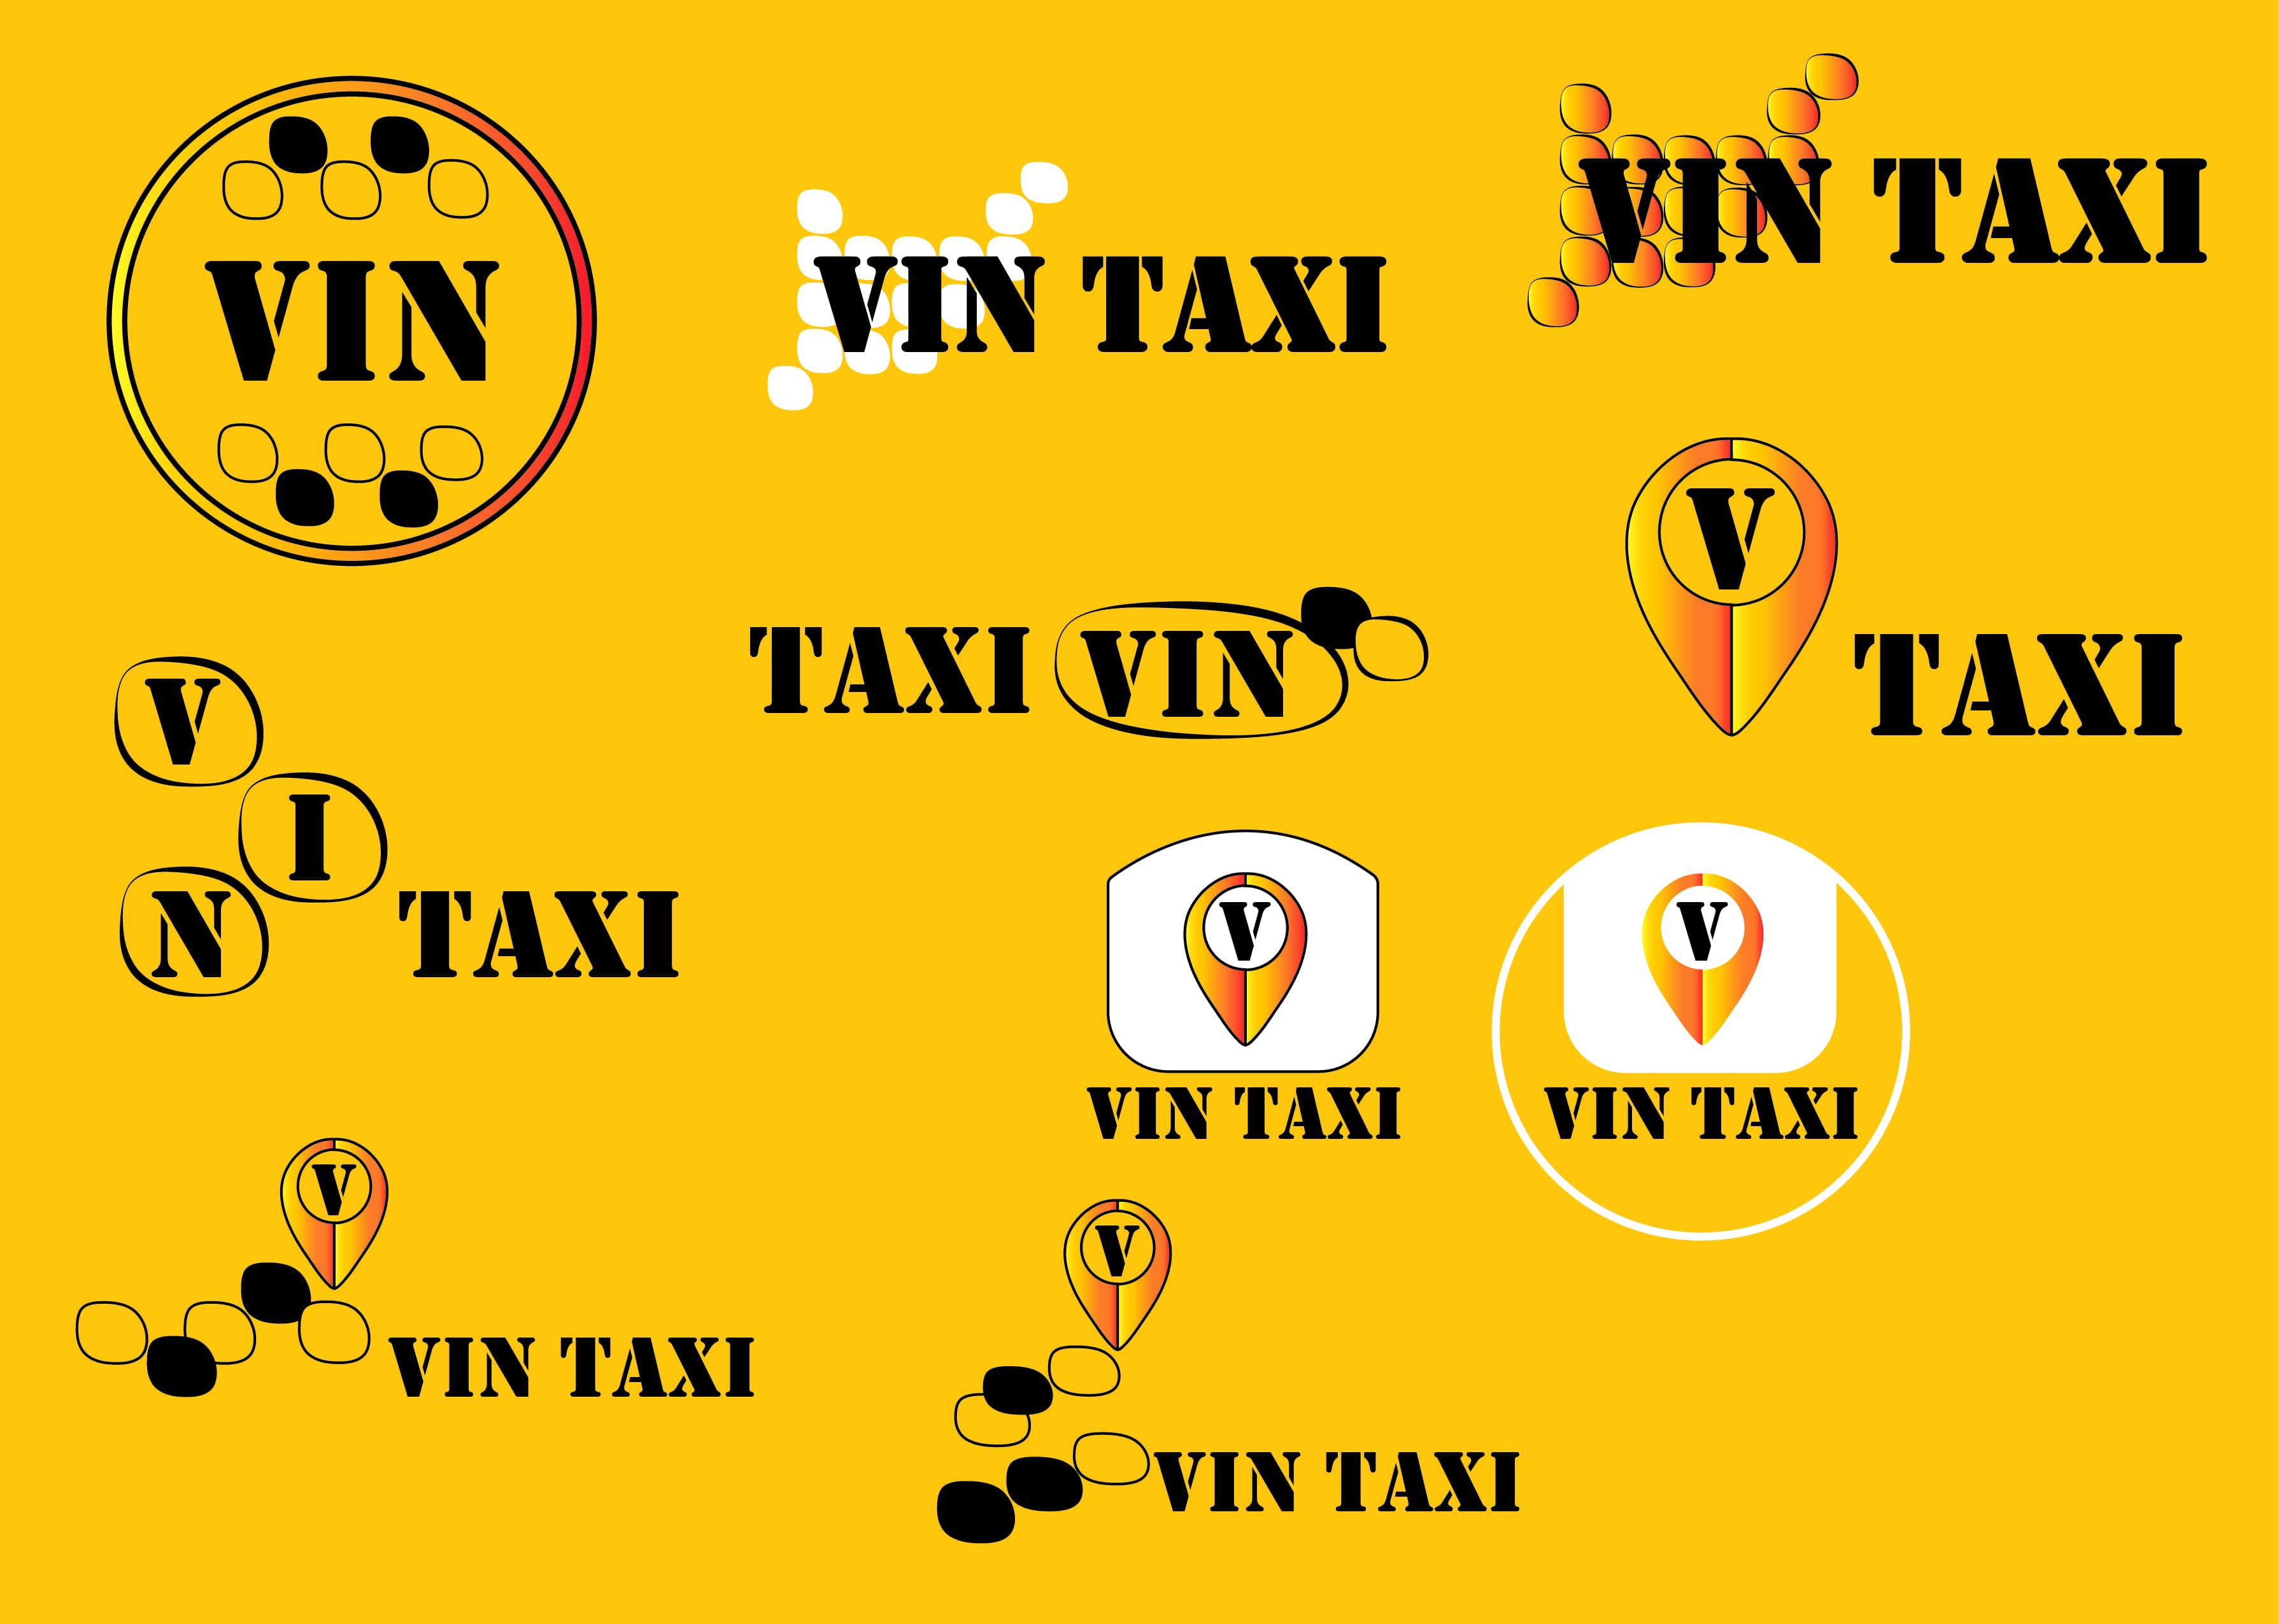 Разработка логотипа и фирменного стиля для такси фото f_7905b9eb8ffd3241.jpg